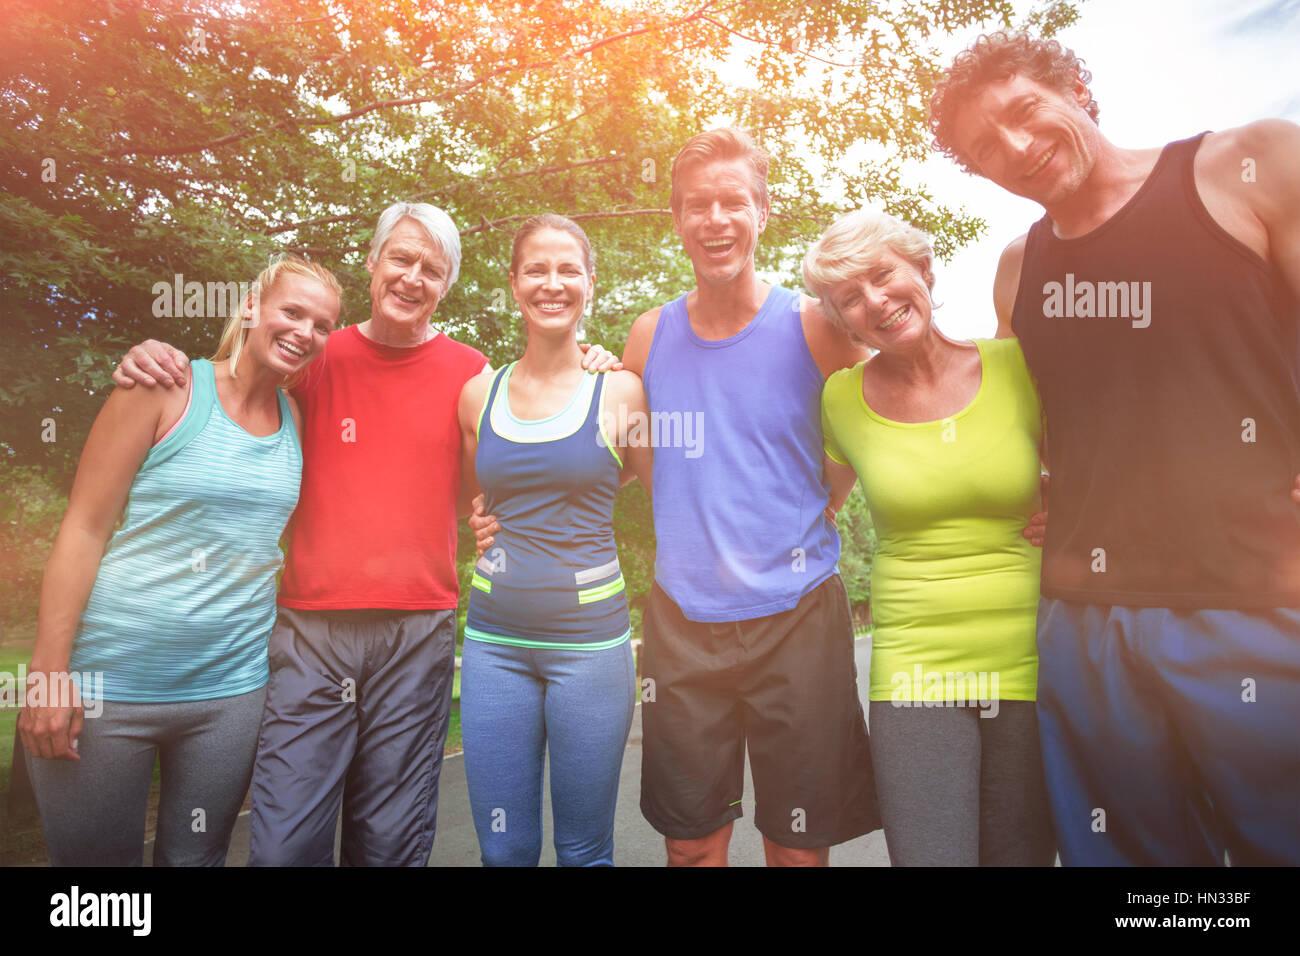 Portrait of marathon athletes posing in park - Stock Image